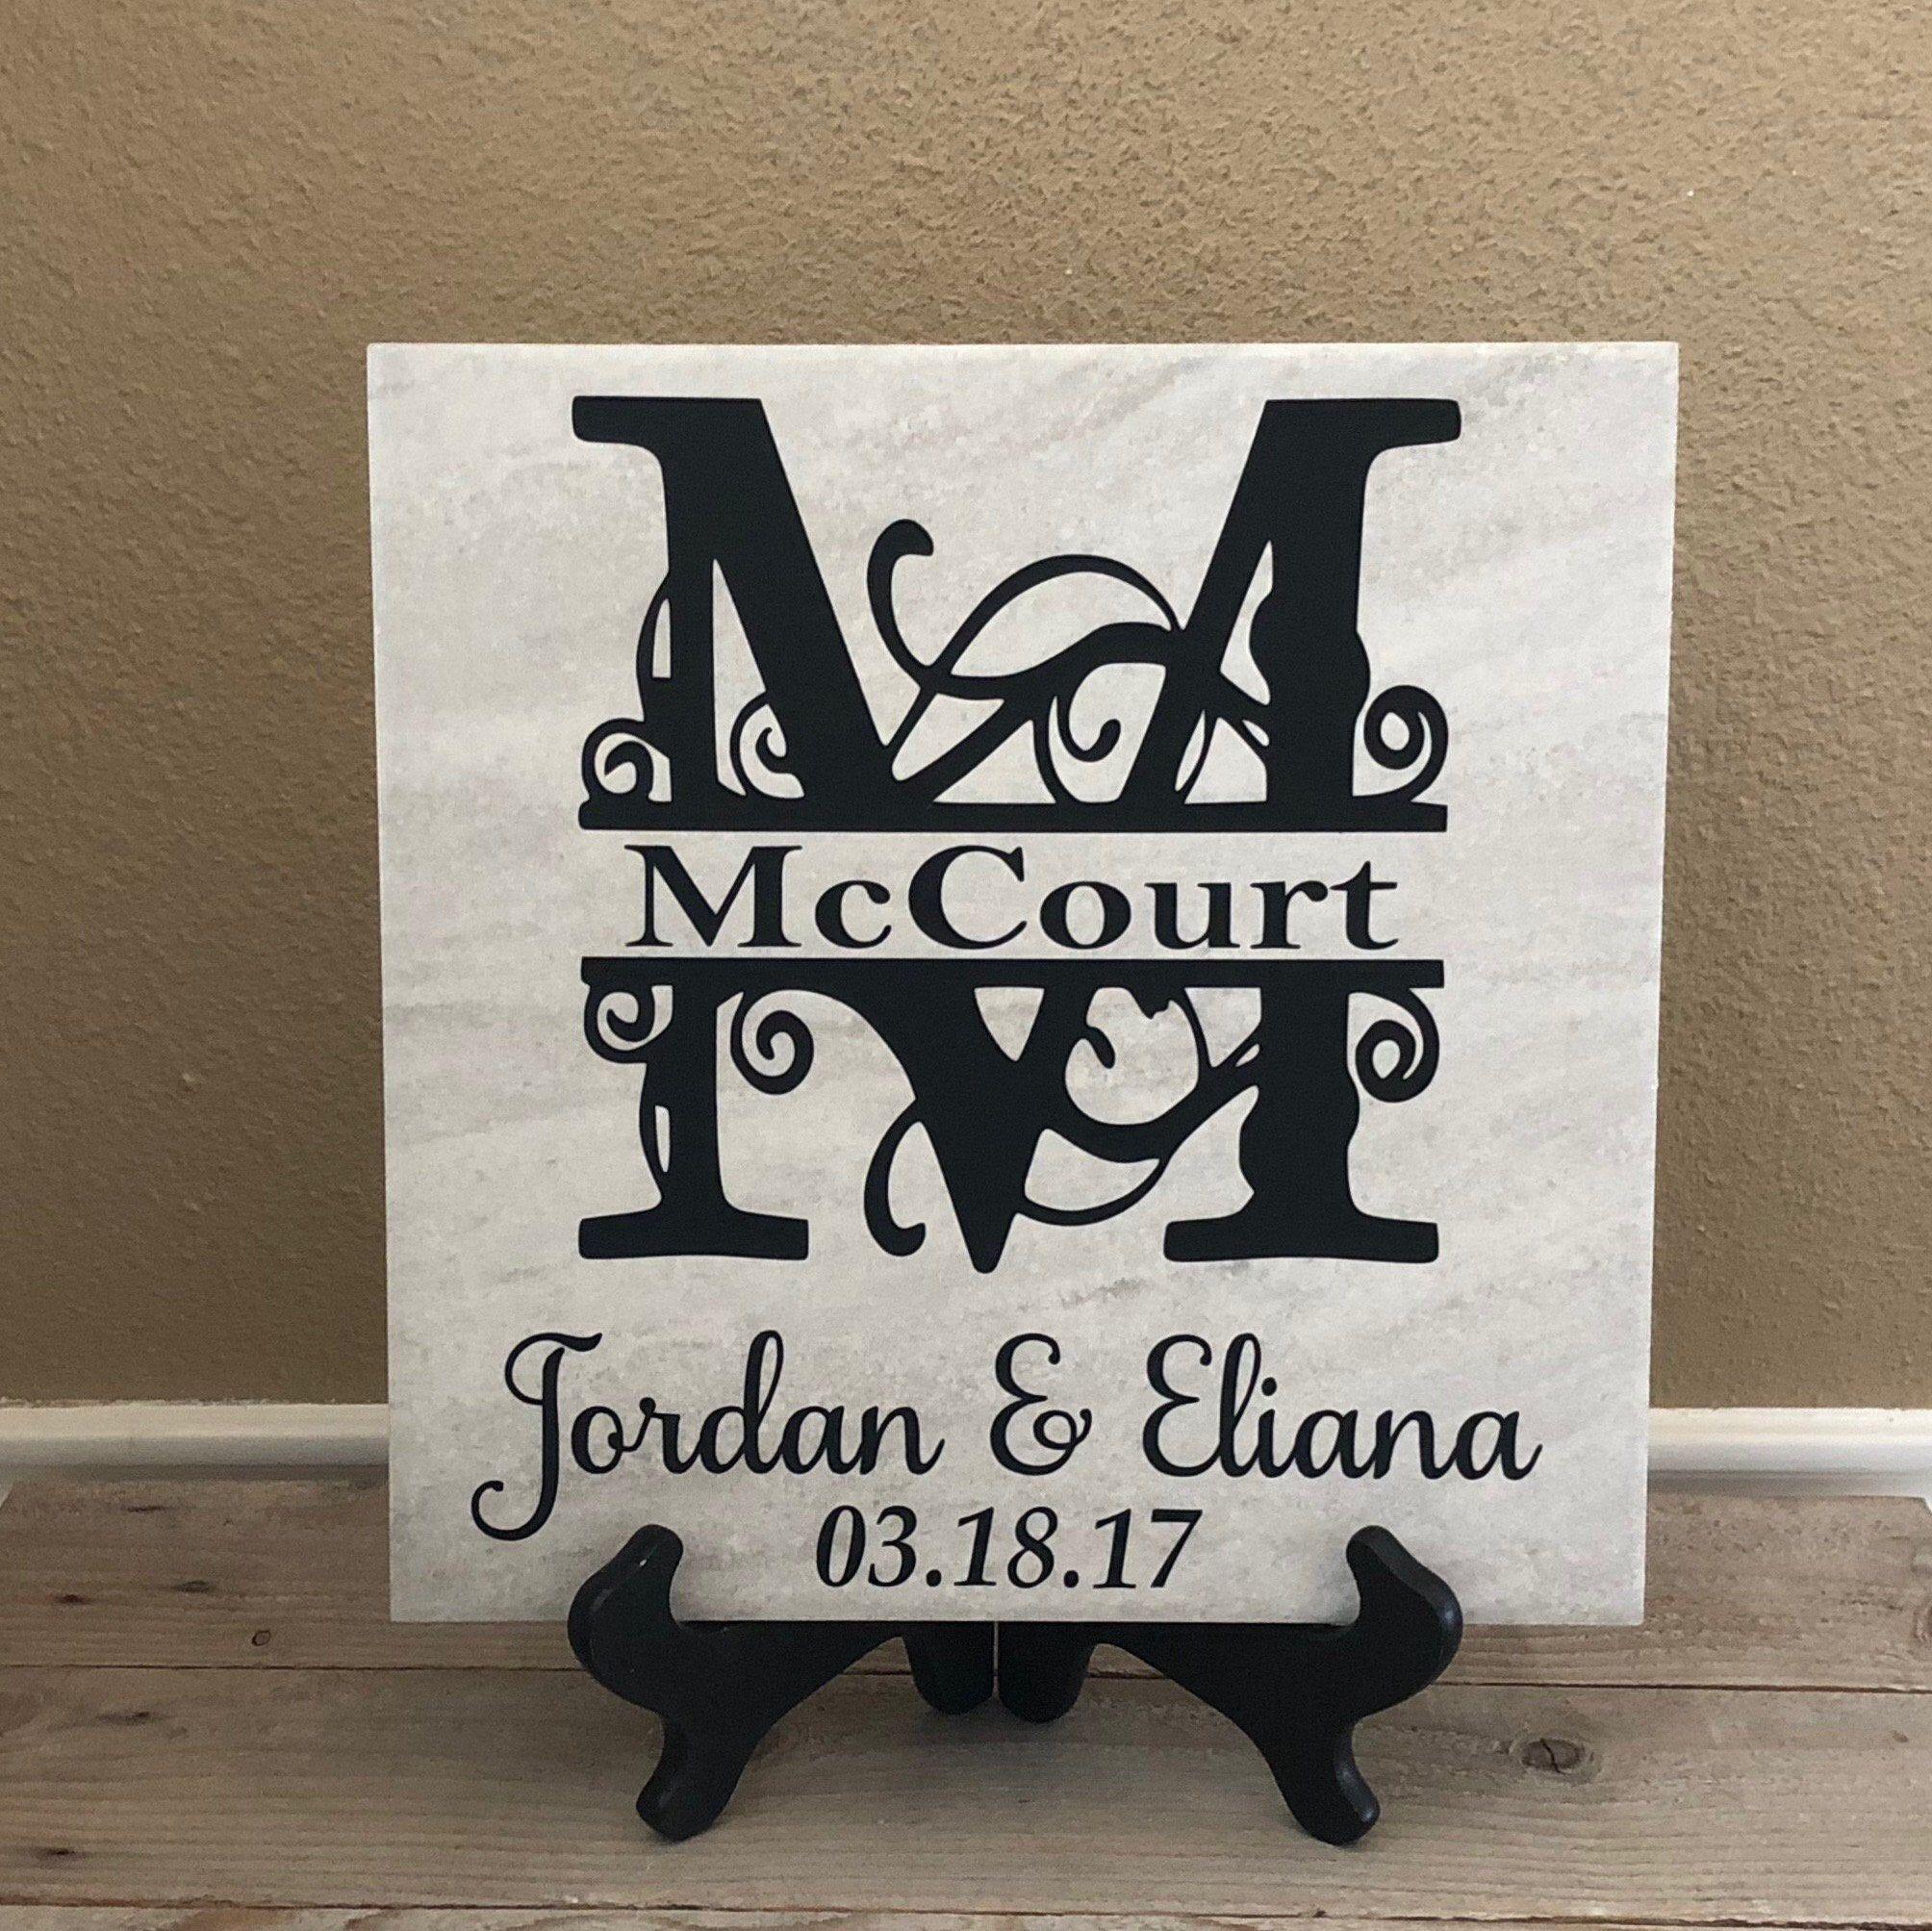 Wedding Gift Wedding Gift Personalized Gifts For Couple Etsy Personalized Wedding Gifts Newlywed Gifts Personalized Couple Gifts